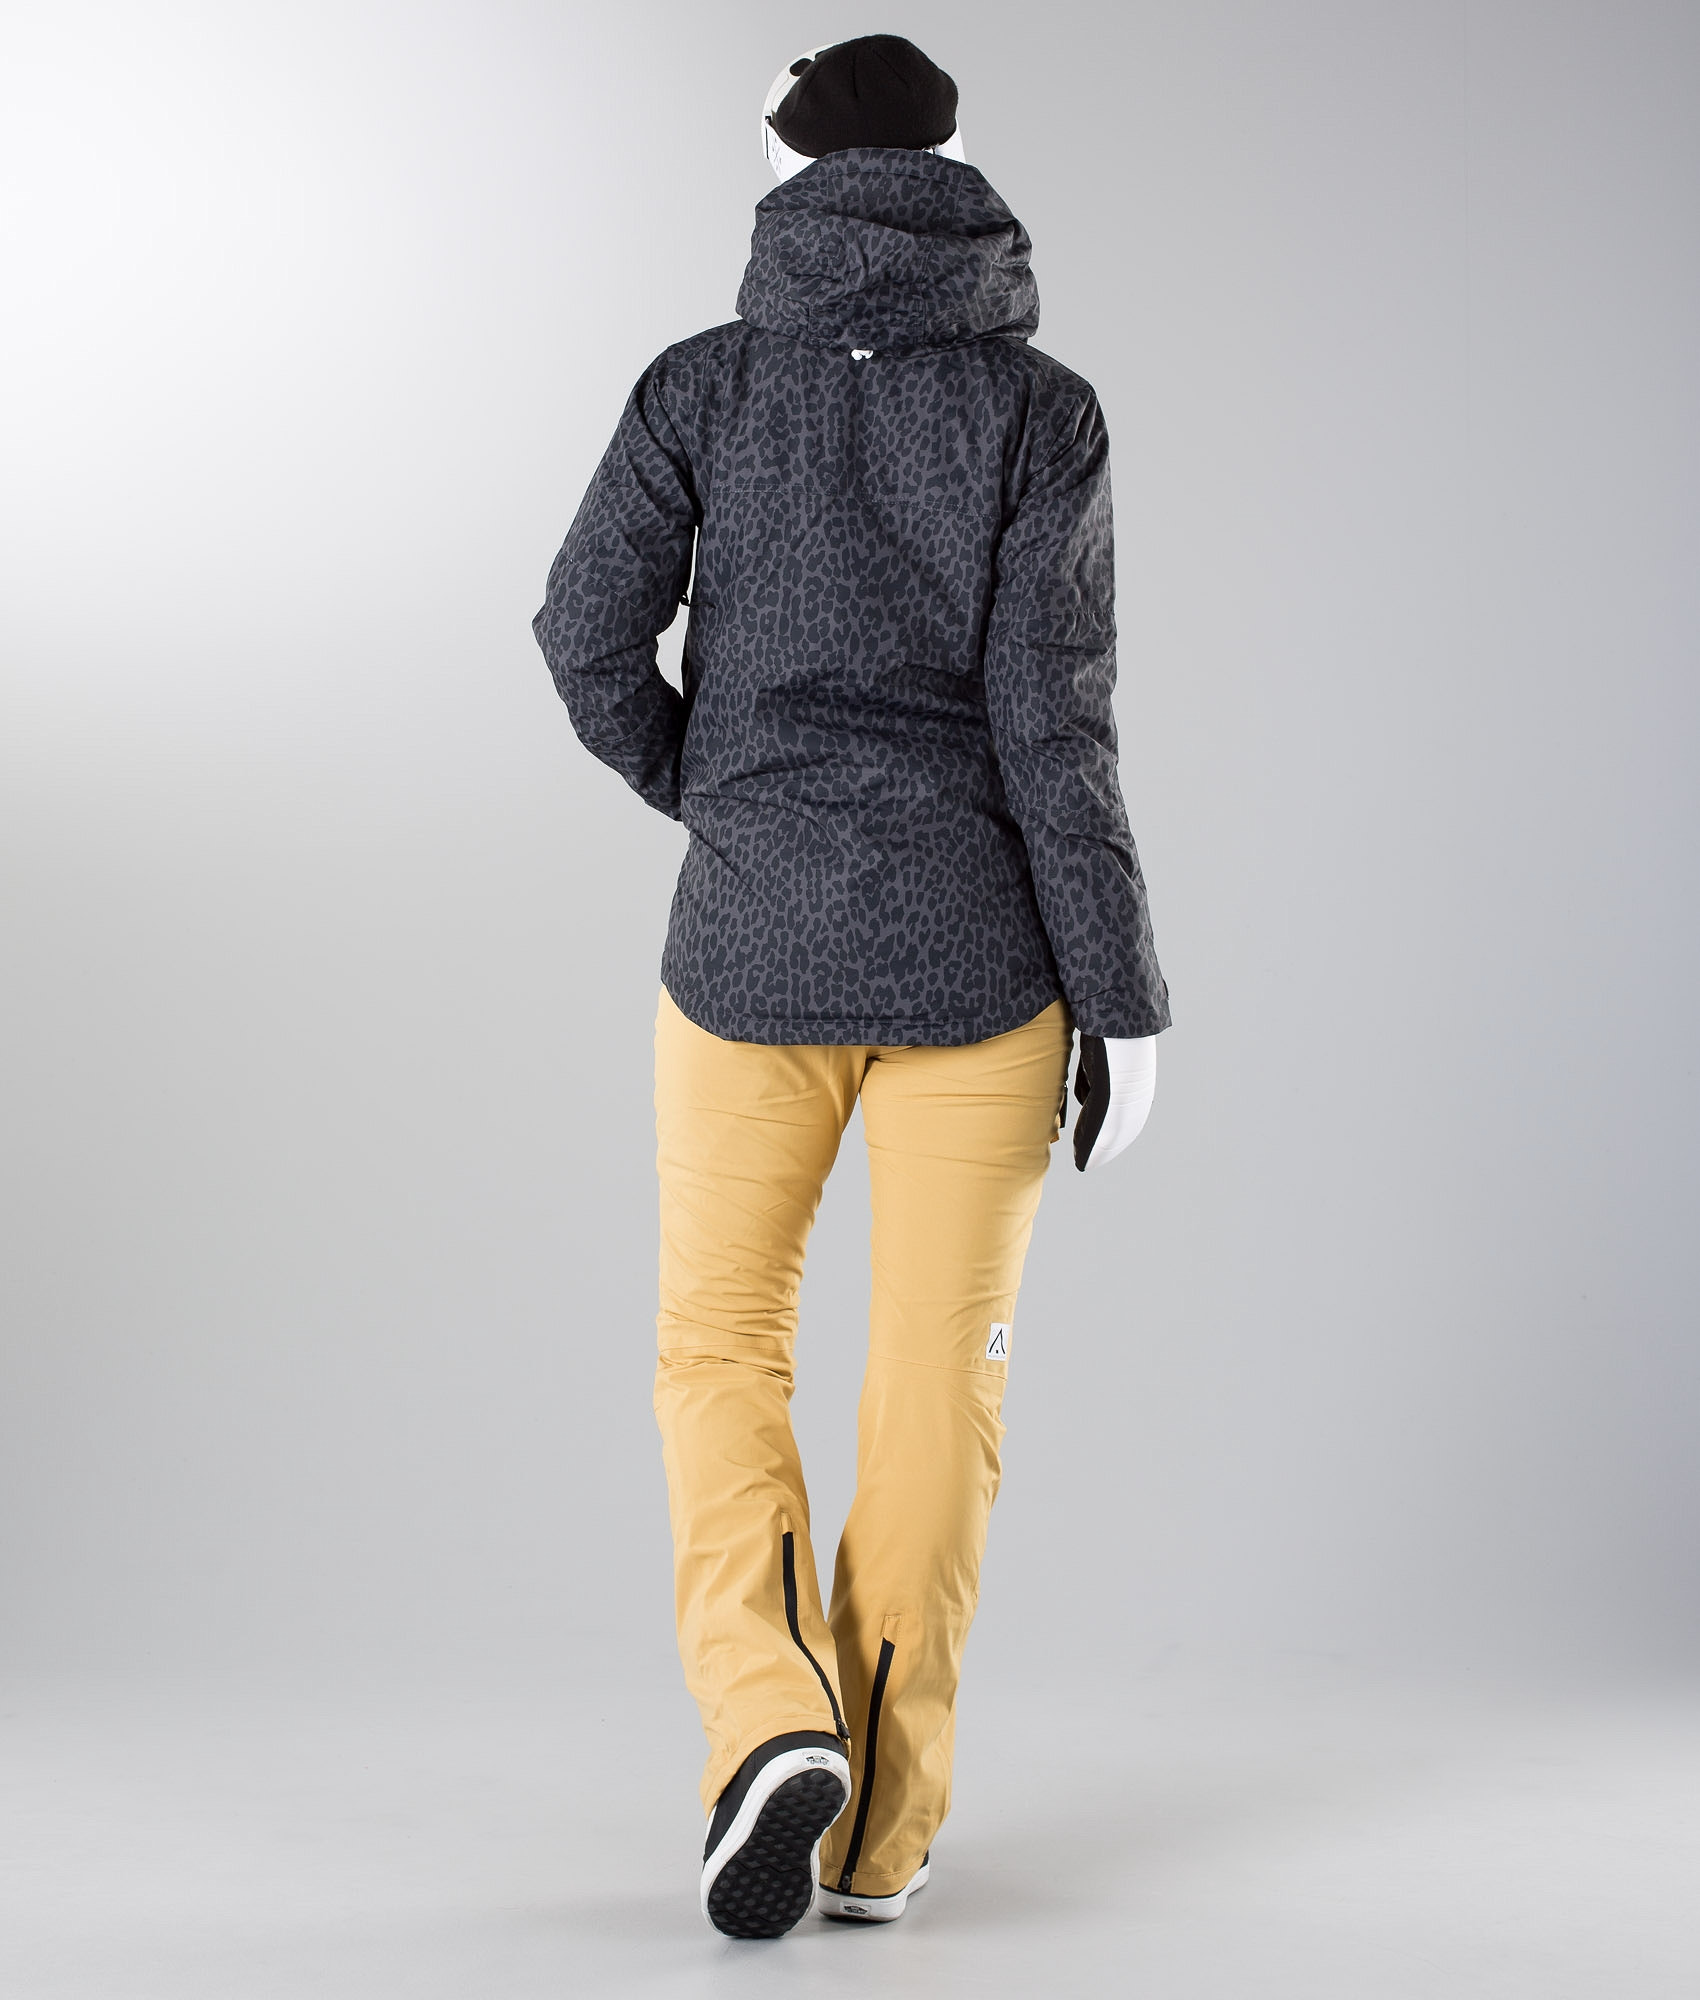 WearColour Homage Snowboard Jacket Black Leo - Ridestore.com 143097d75f